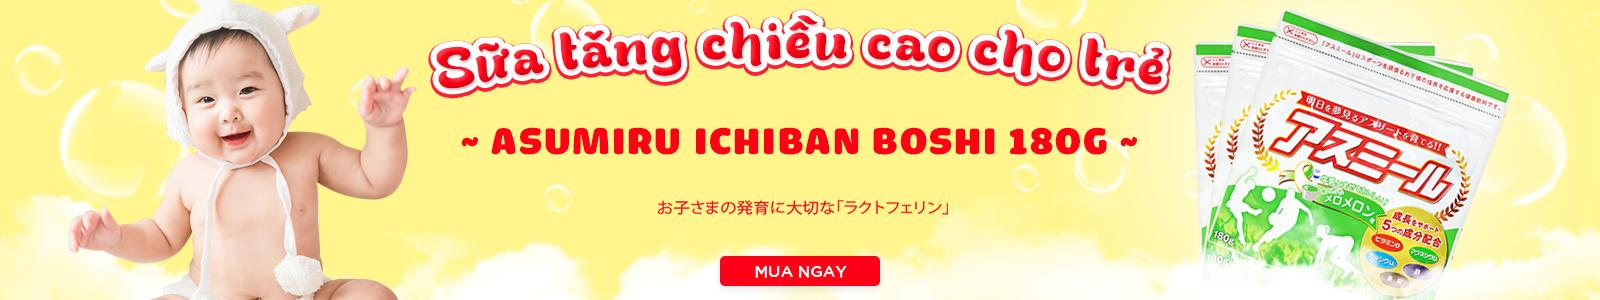 Sữa tăng chiều cao cho trẻ Asumiru Ichiban Boshi